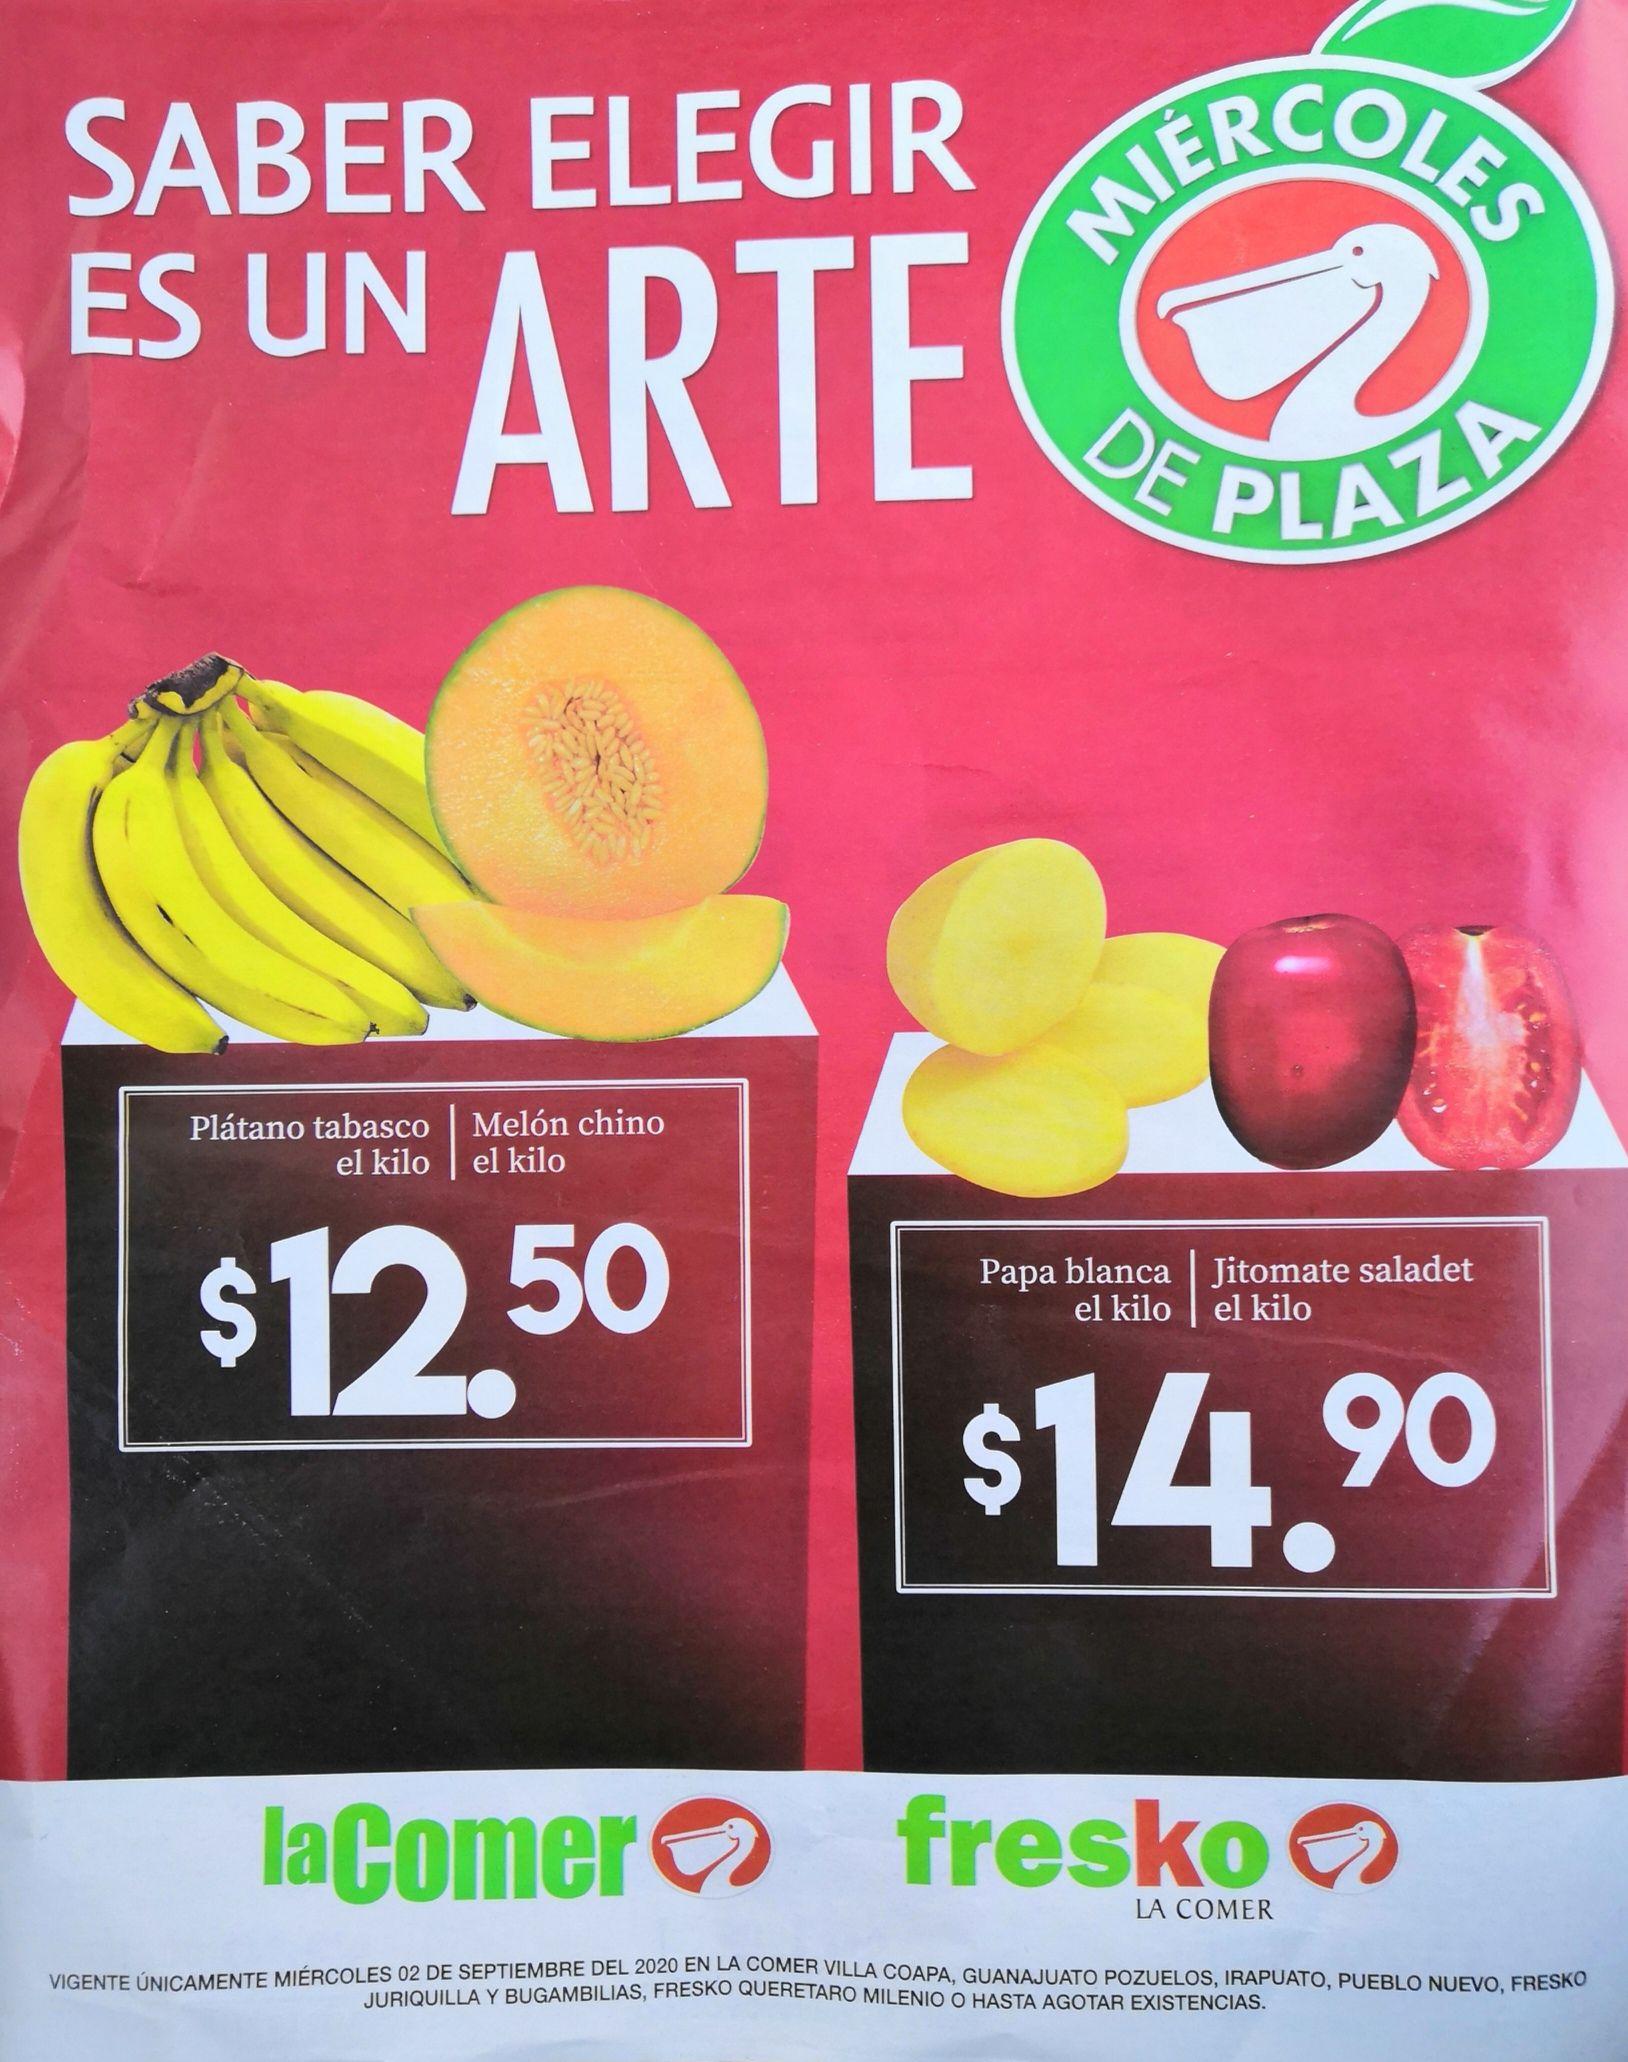 La Comer y Fresko: Miércoles de Plaza 2 Septiembre: Plátano ó Melón $12.50 kg... Papa ó Jitomate $14.90 kg.